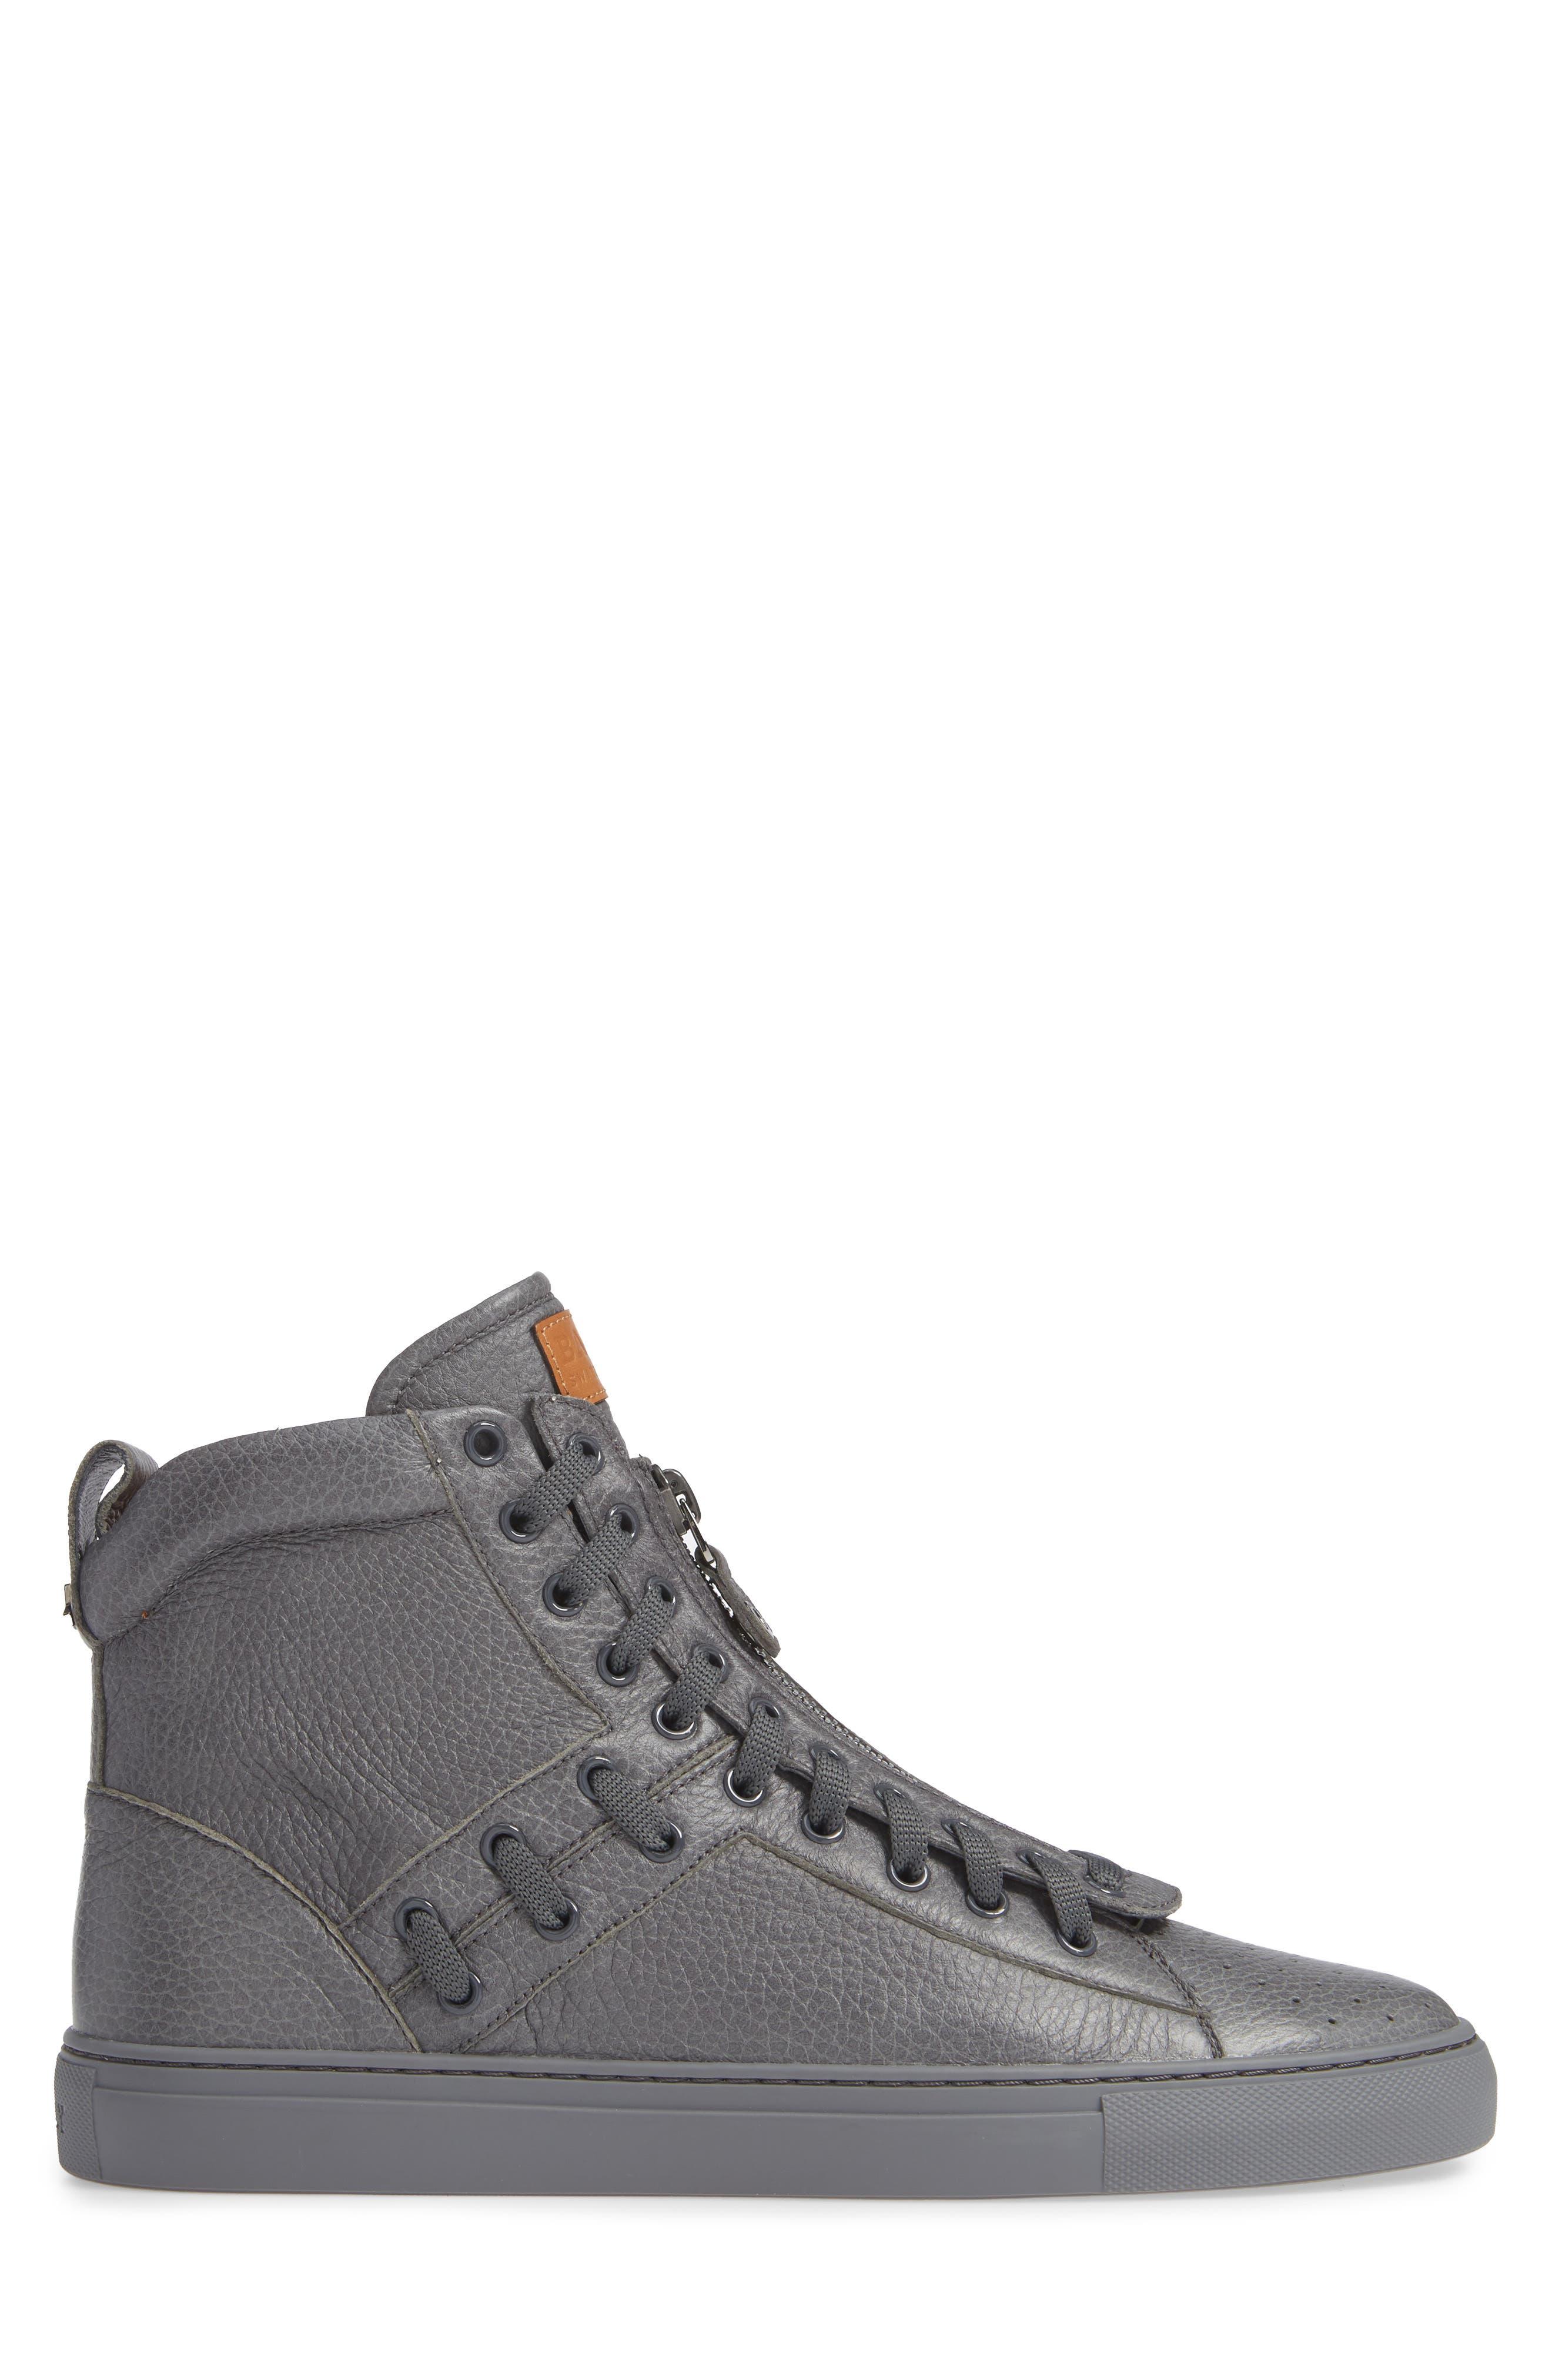 Hekem High-Top Sneaker,                             Alternate thumbnail 3, color,                             GARCONE GREY